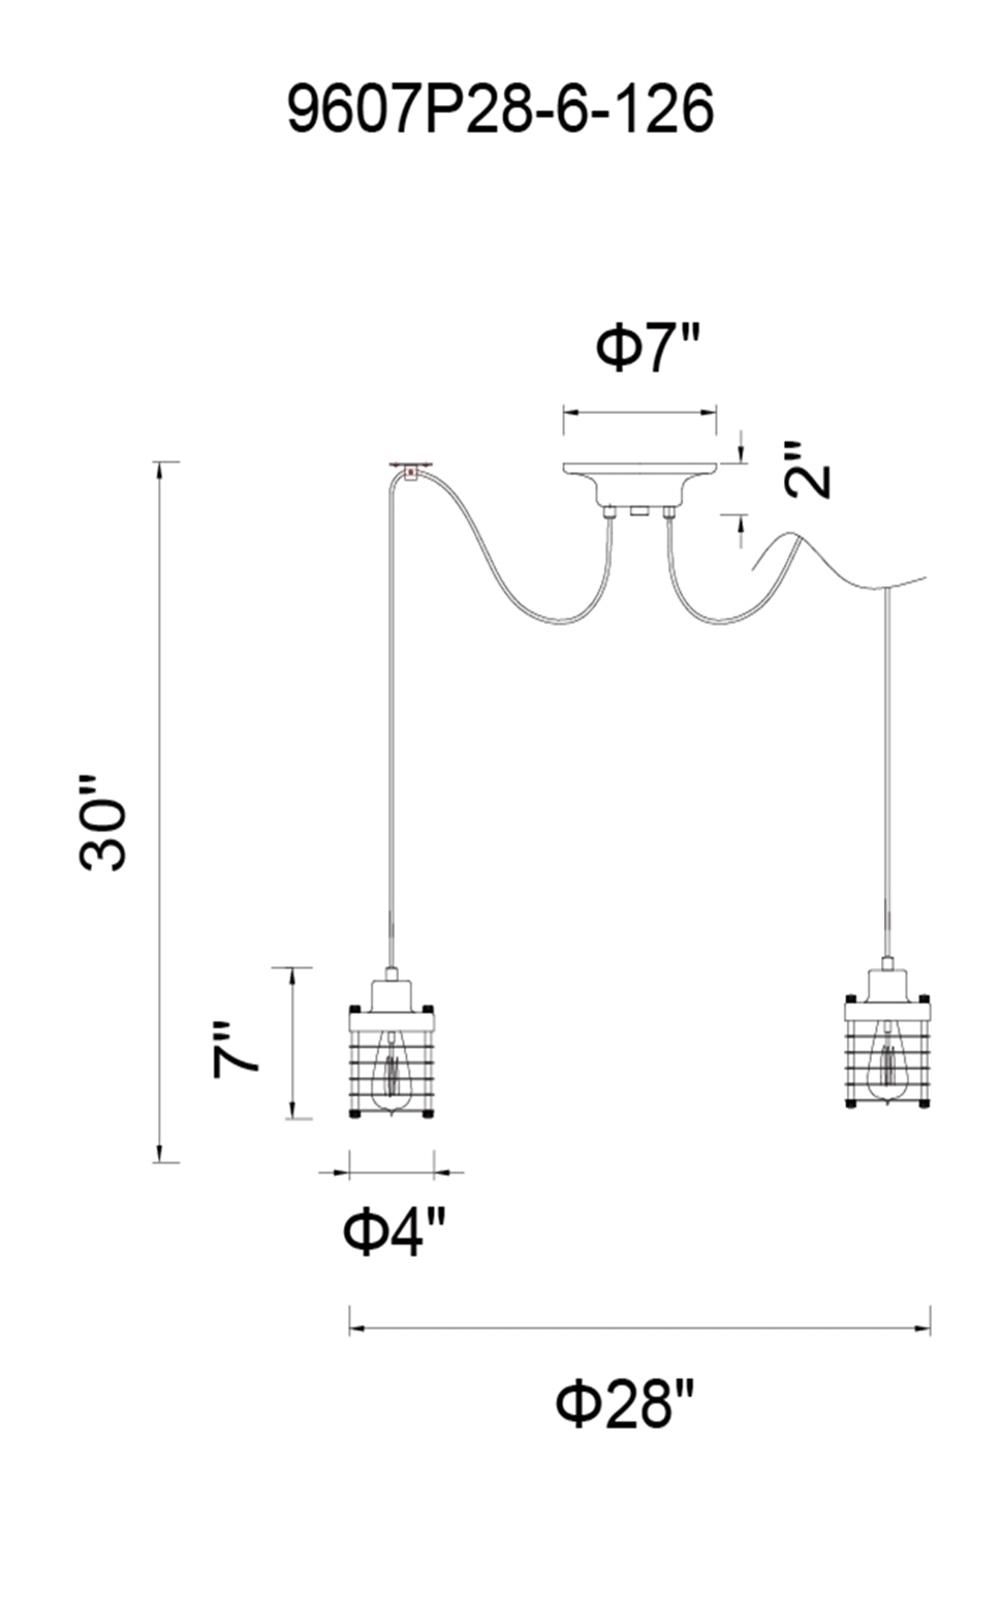 CWI Lighting Bray 6 Light Multi Light Pendant With Chocolate Model: 9607P28-6-126 Line Drawing